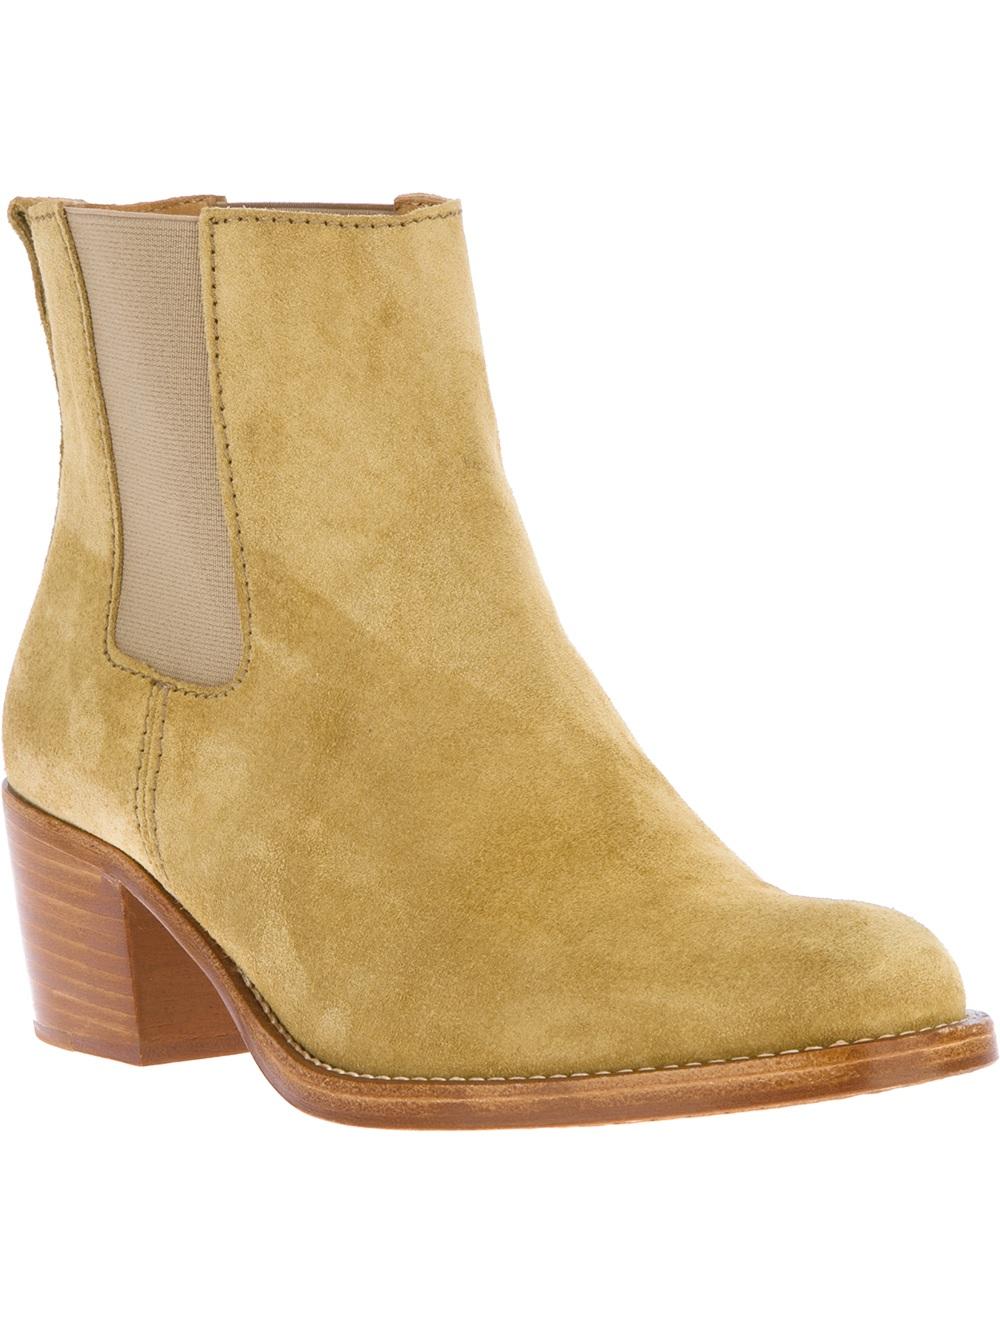 e3db7d51606f Lyst - A.P.C. Pull On Ankle Boot in Natural